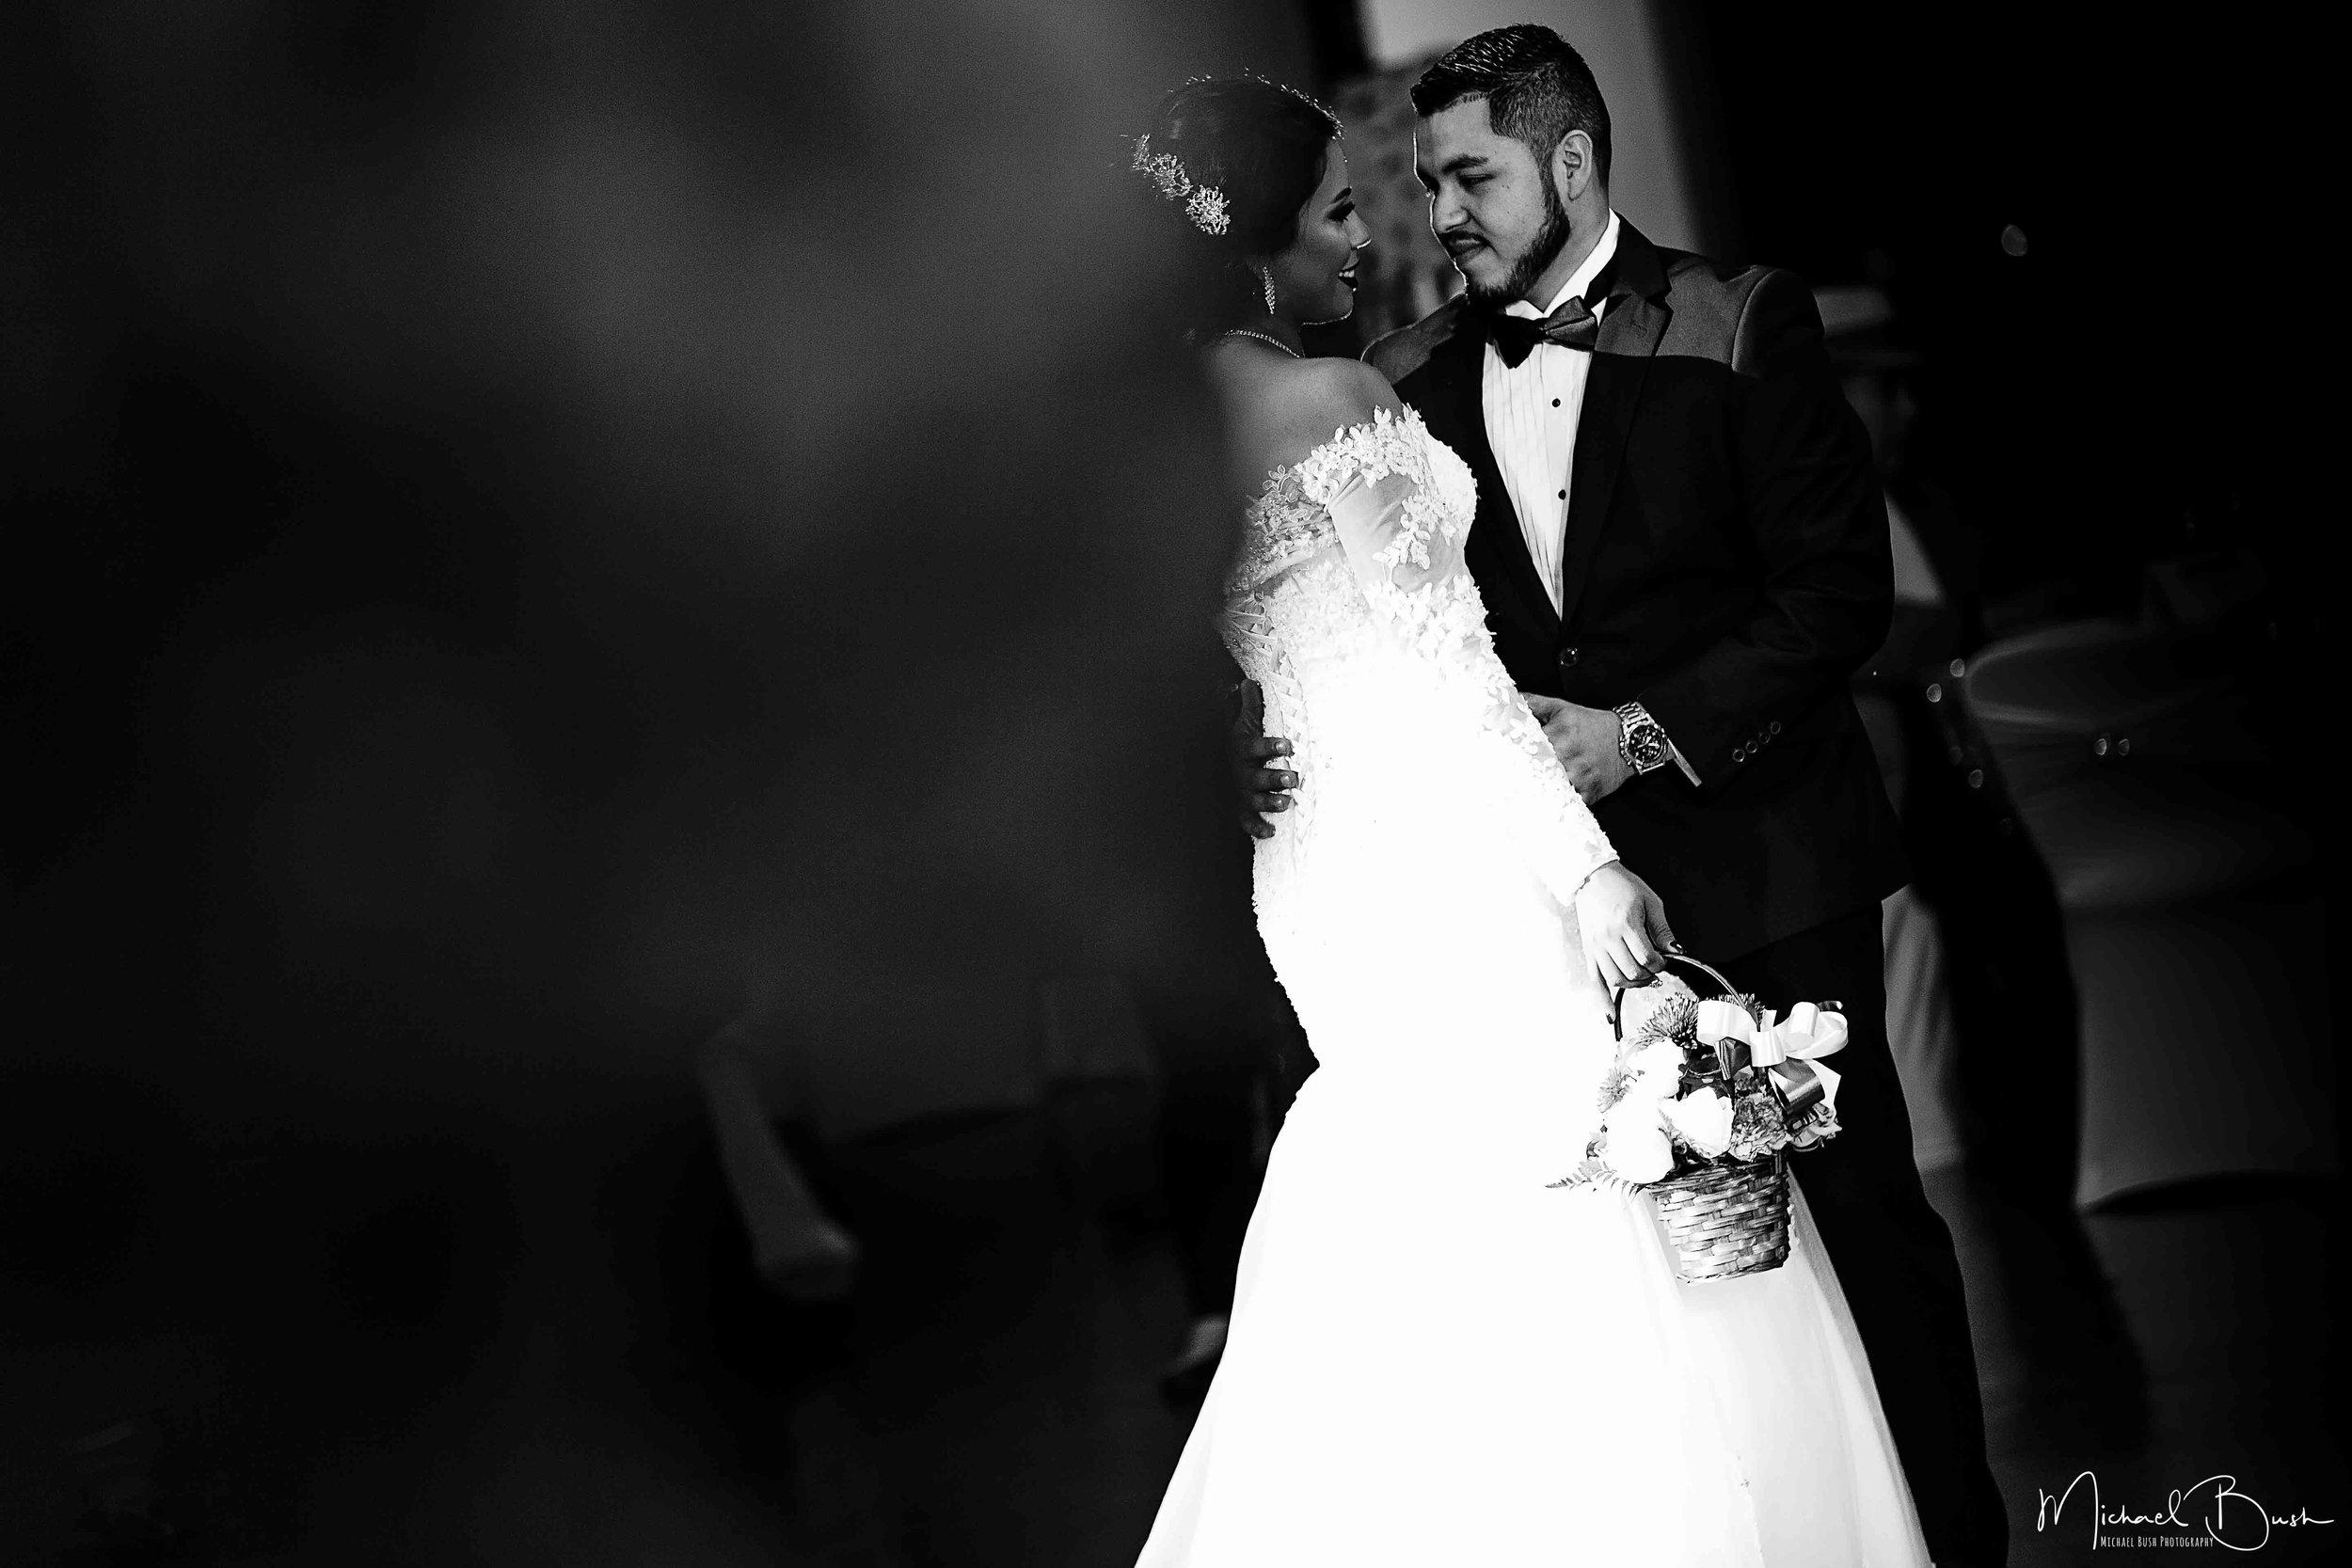 Wedding-Reception-Detials-Fort-Worth-Venue-love-first-dance-b&w.jpg